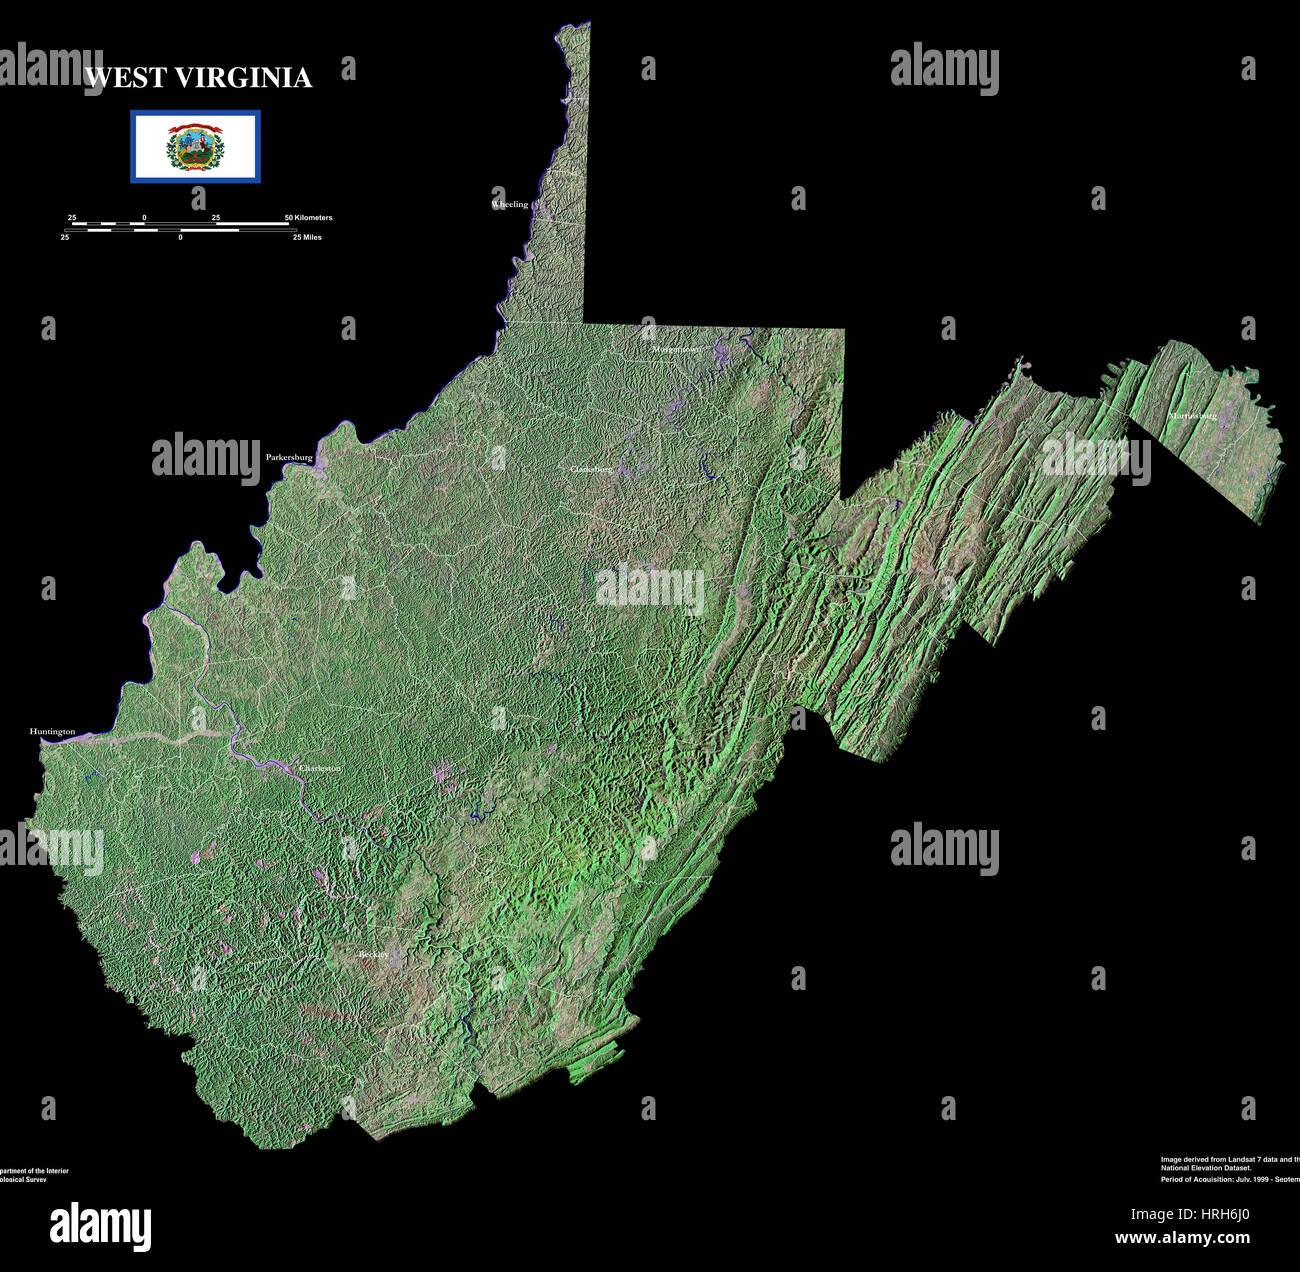 West Virginia - Stock Image